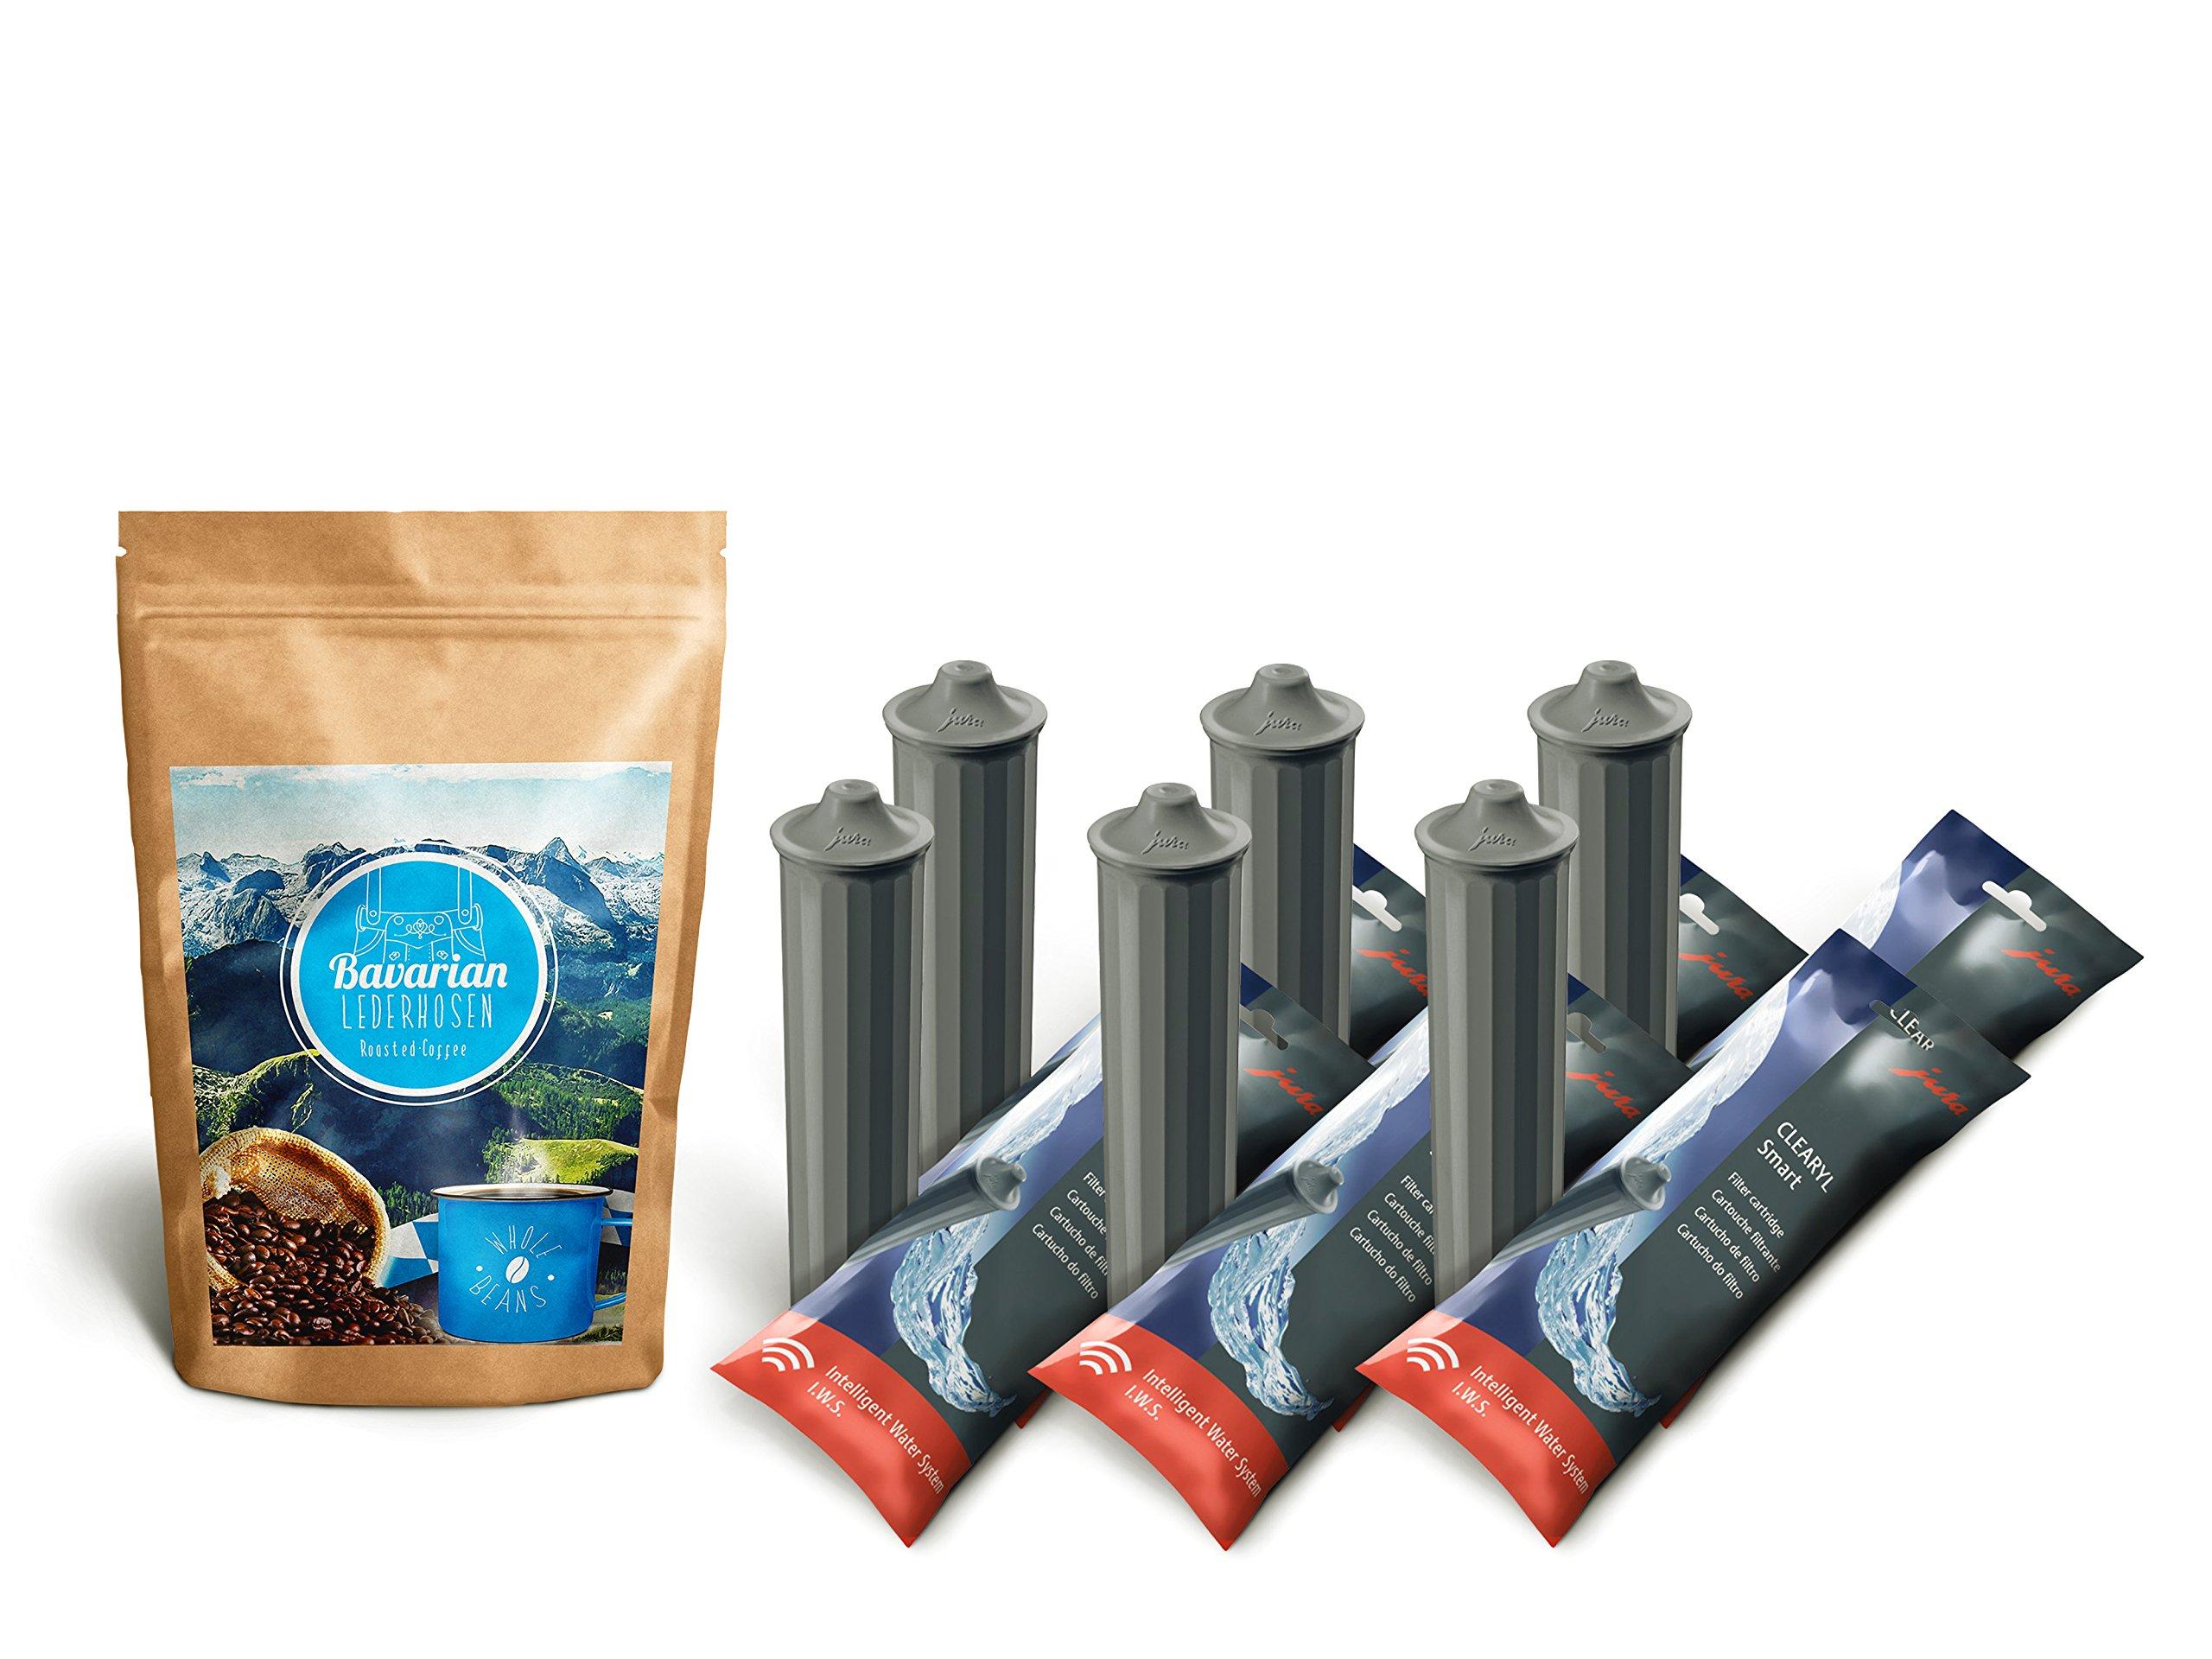 Bavarian Lederhosen Whole Beans Coffee 8.8 oz & 6 Jura Clearyl/Claris Smart Filter Cartridges